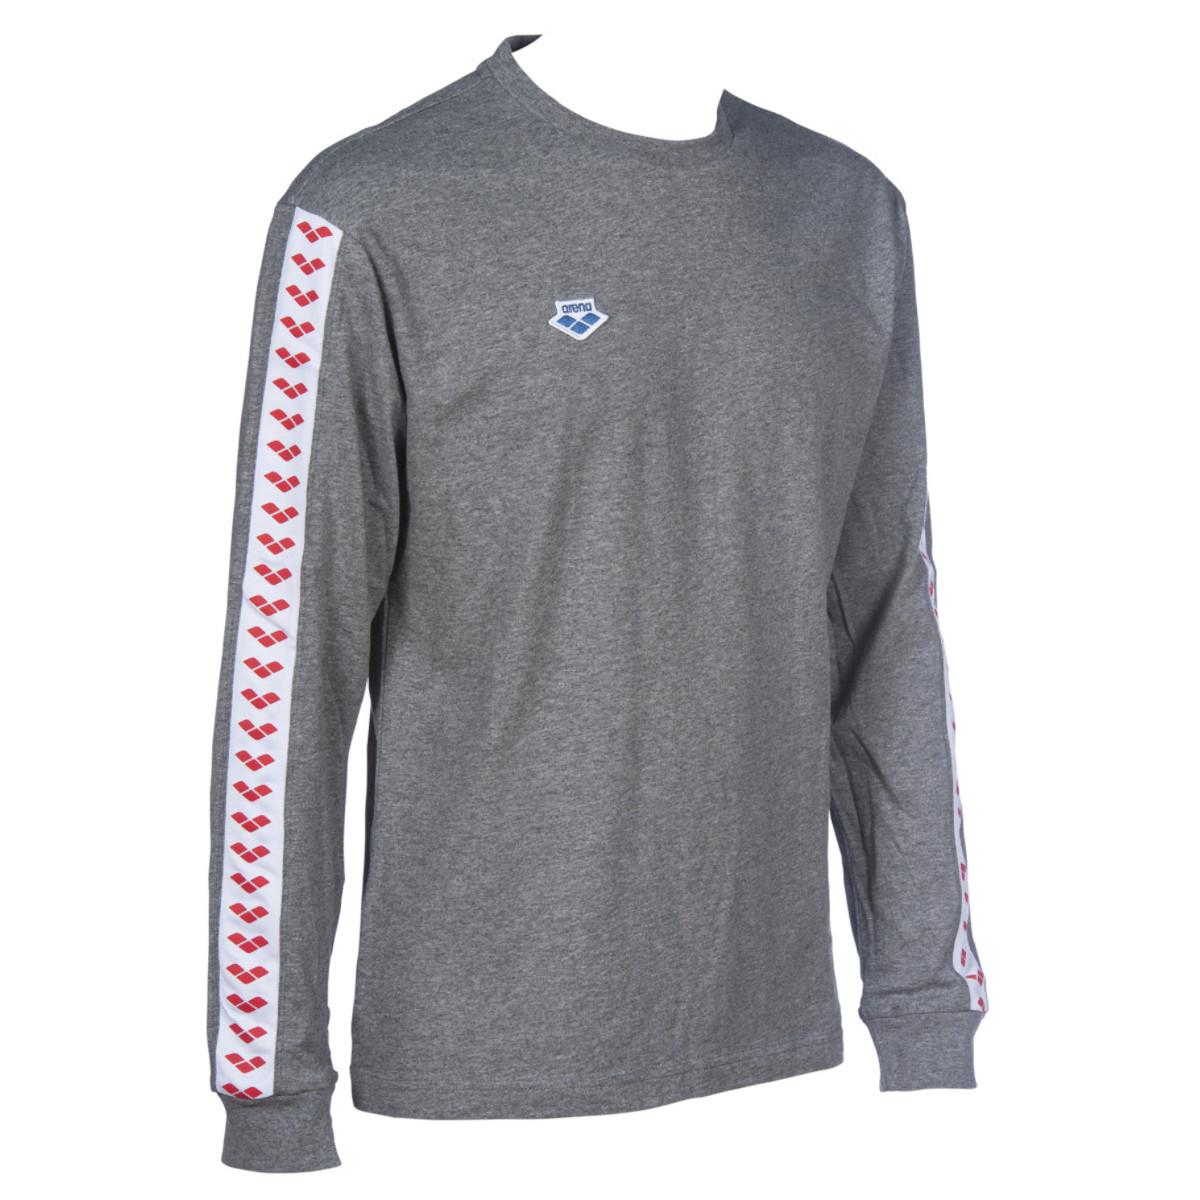 arena Team Long Sleeve Shirt - dark grey melange-white-red